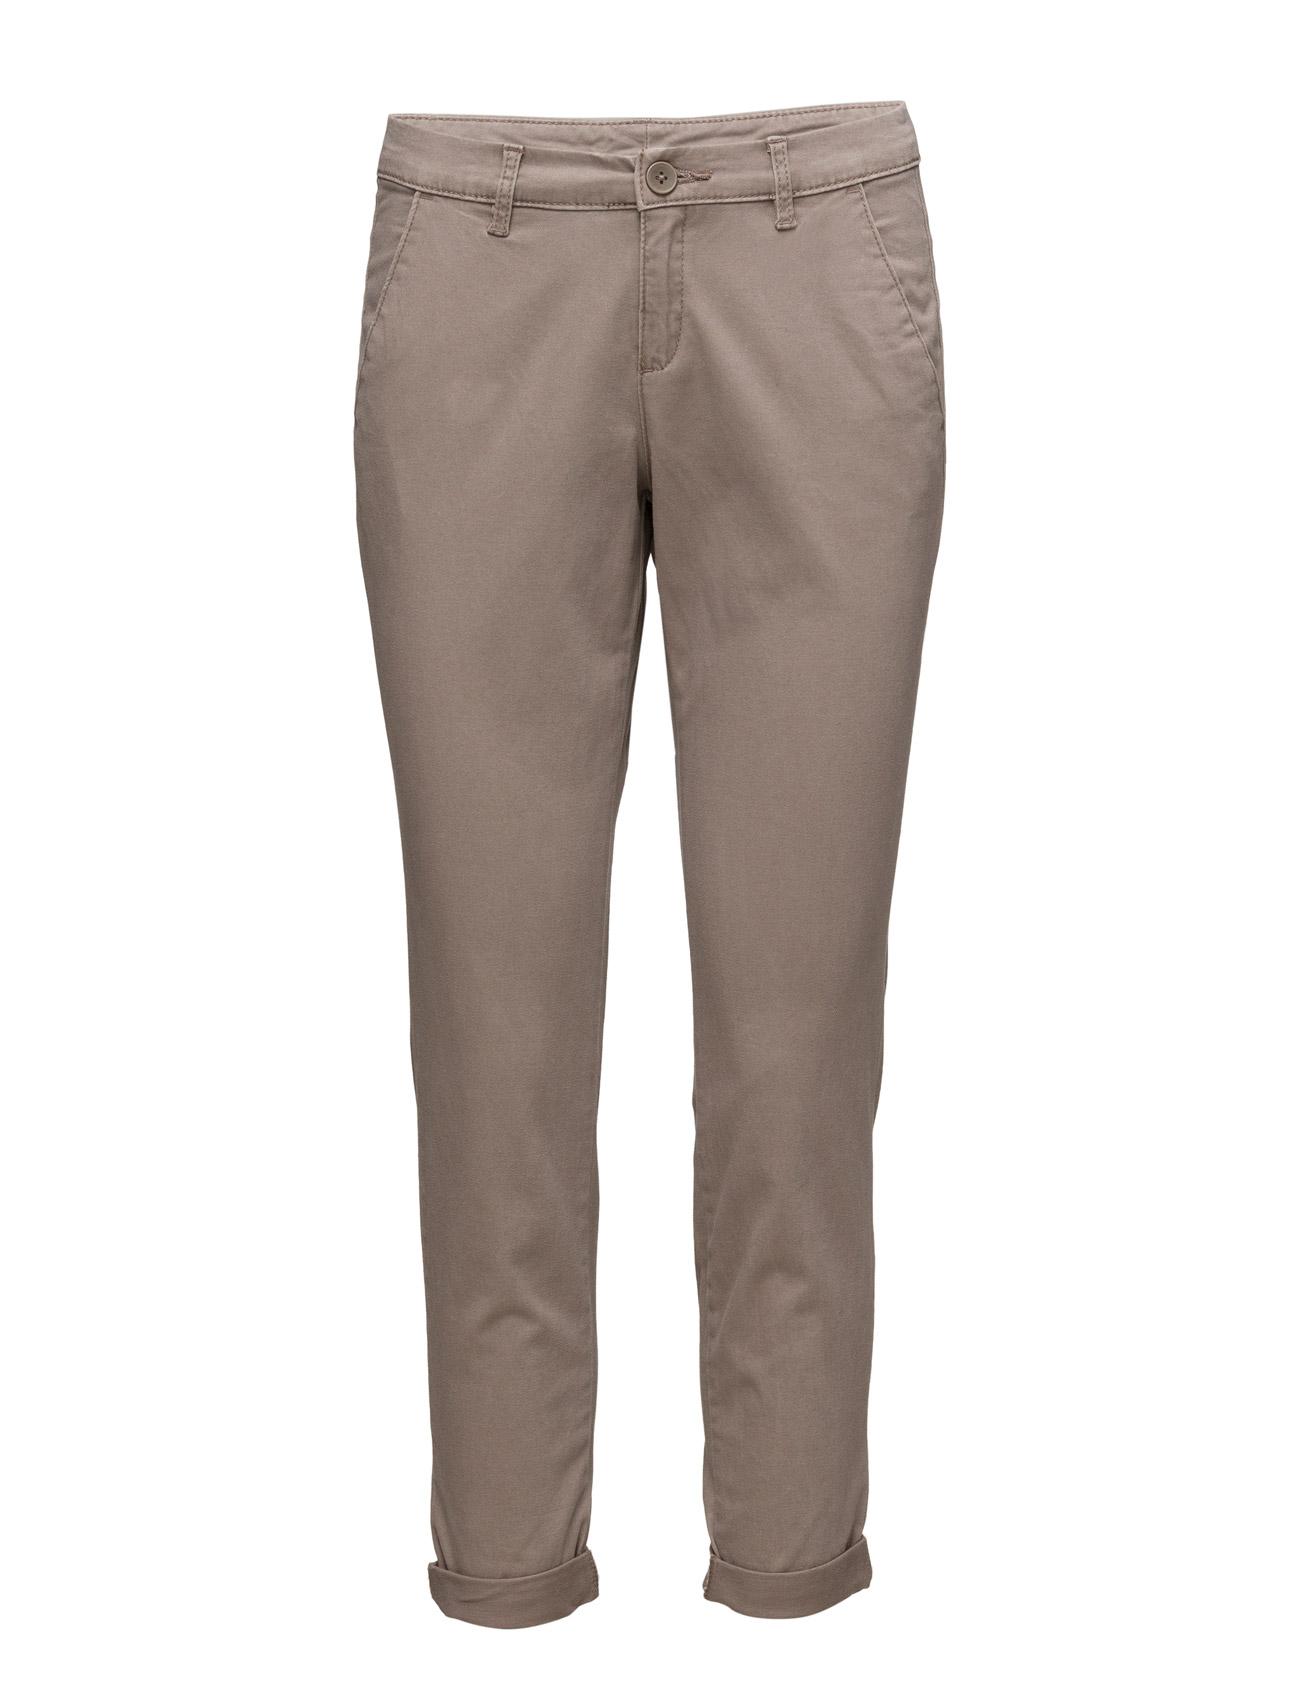 Trousers United Colors of Benetton Chinos til Damer i